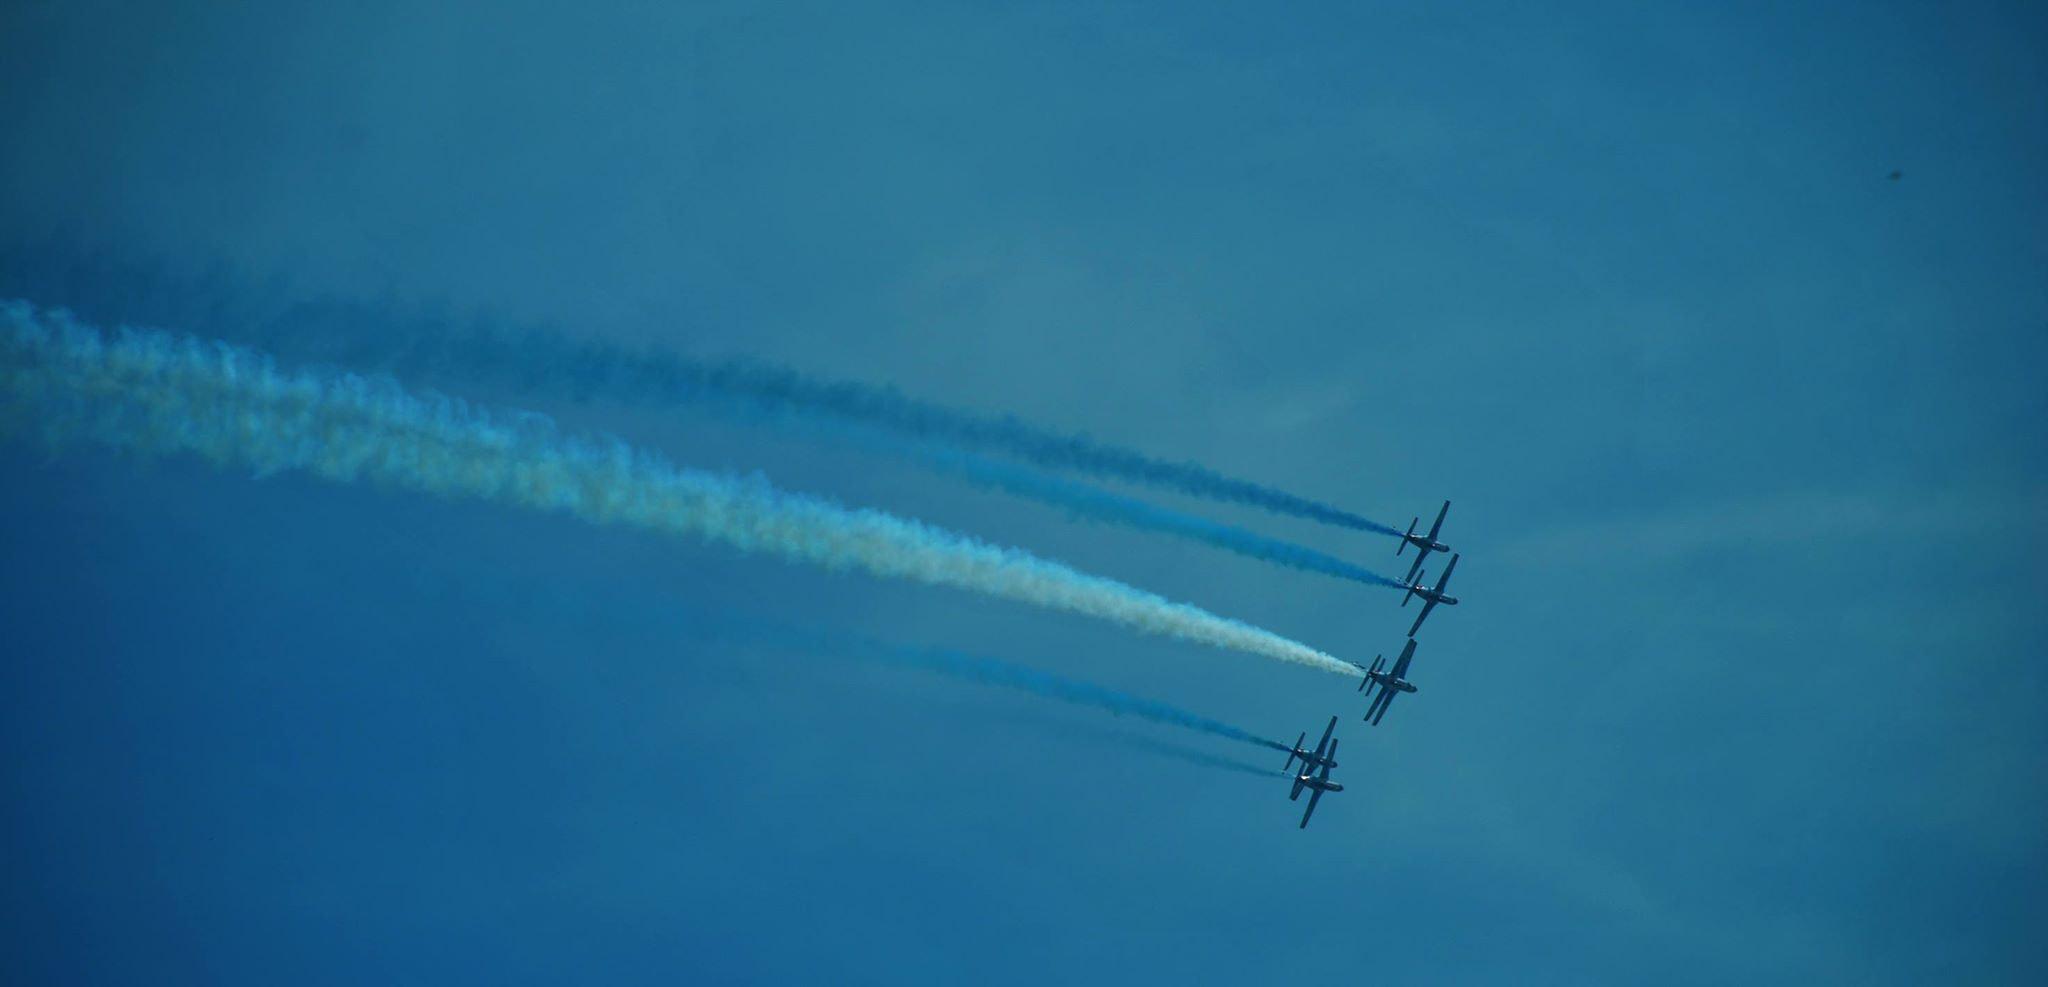 6 Flying Aircraft, Aeroplanes, Aircrafts, Airplanes, Aviation, HQ Photo